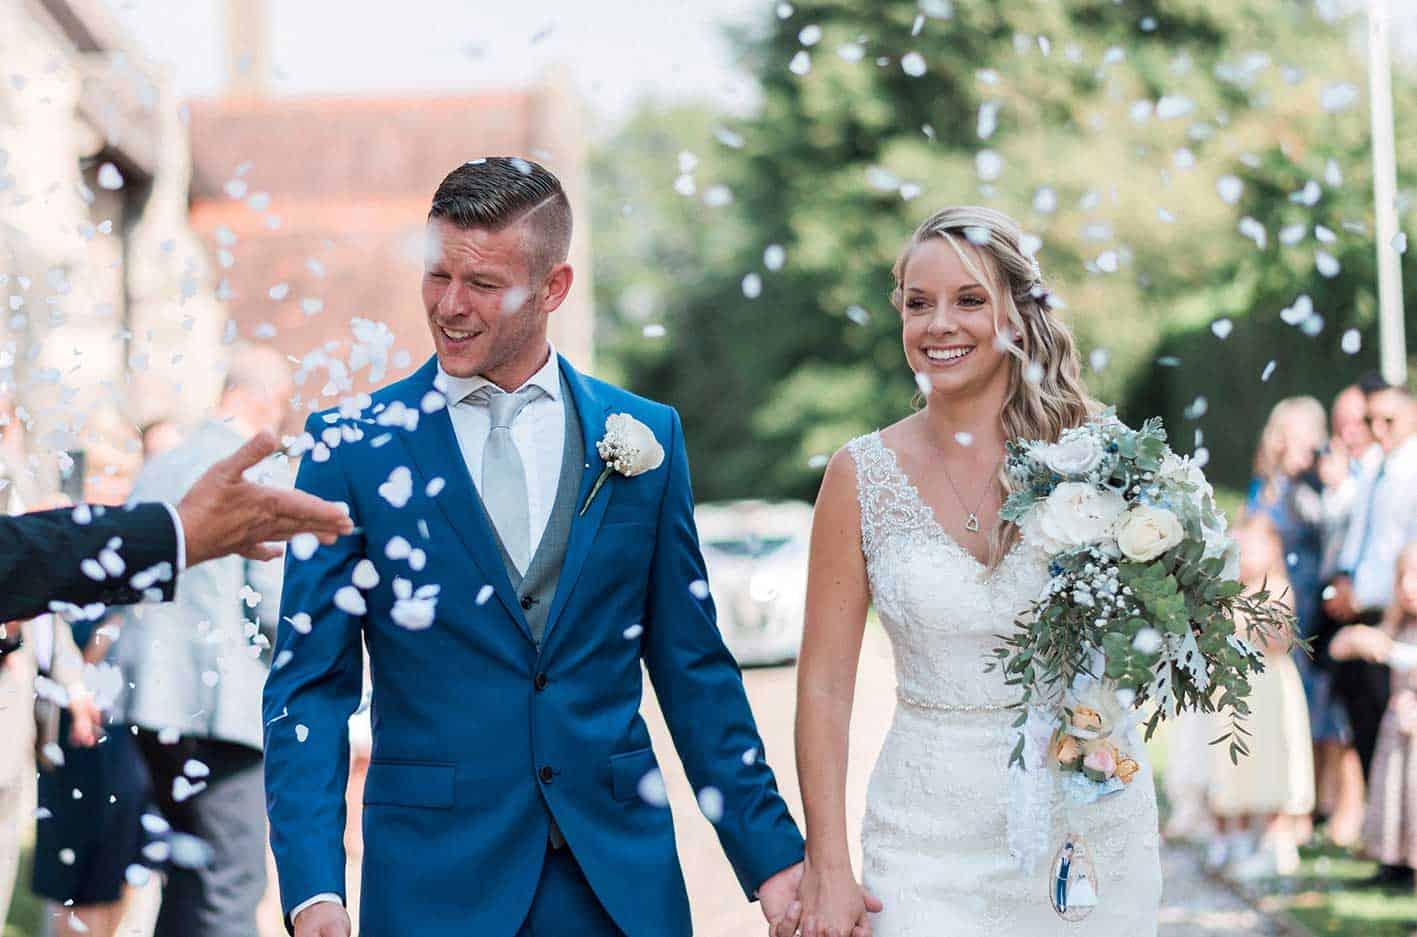 The Wedding of Holly & Ross – Crondon Park Wedding, Essex